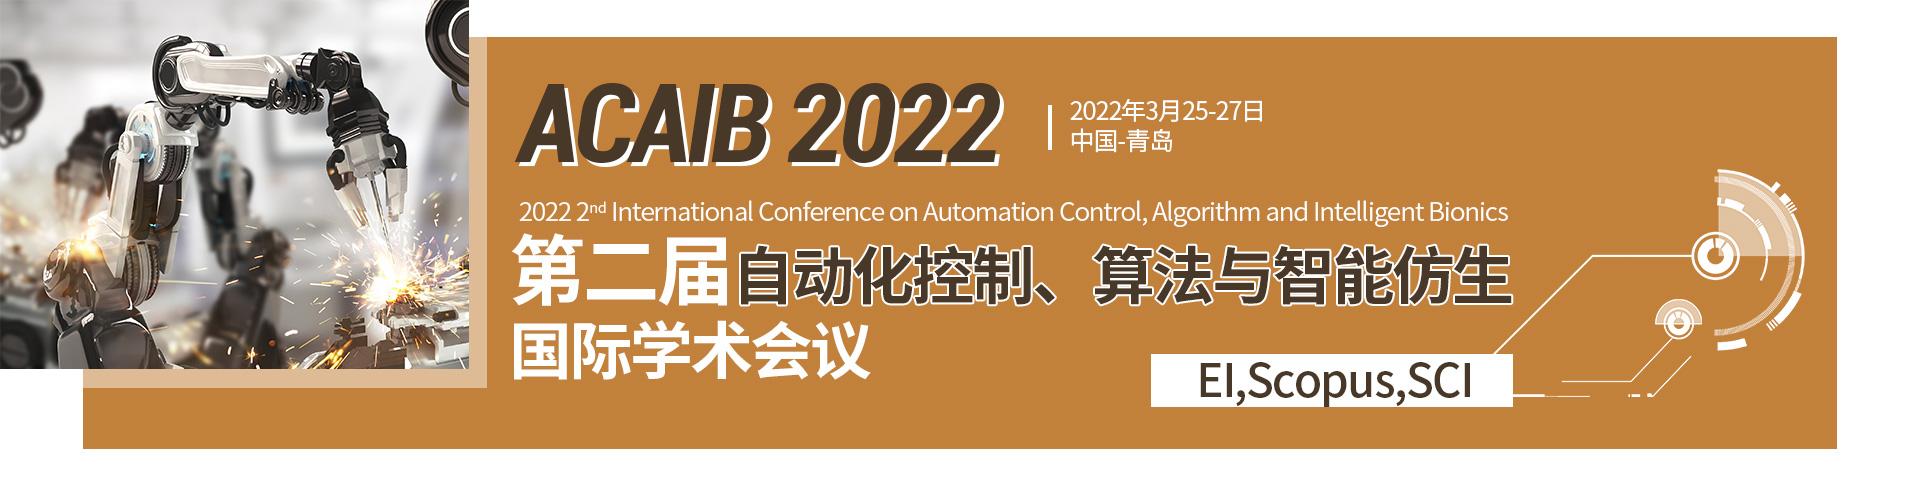 3月青岛-ACAIB2022-会议艾思banner-张寅婕-20210812.jpg